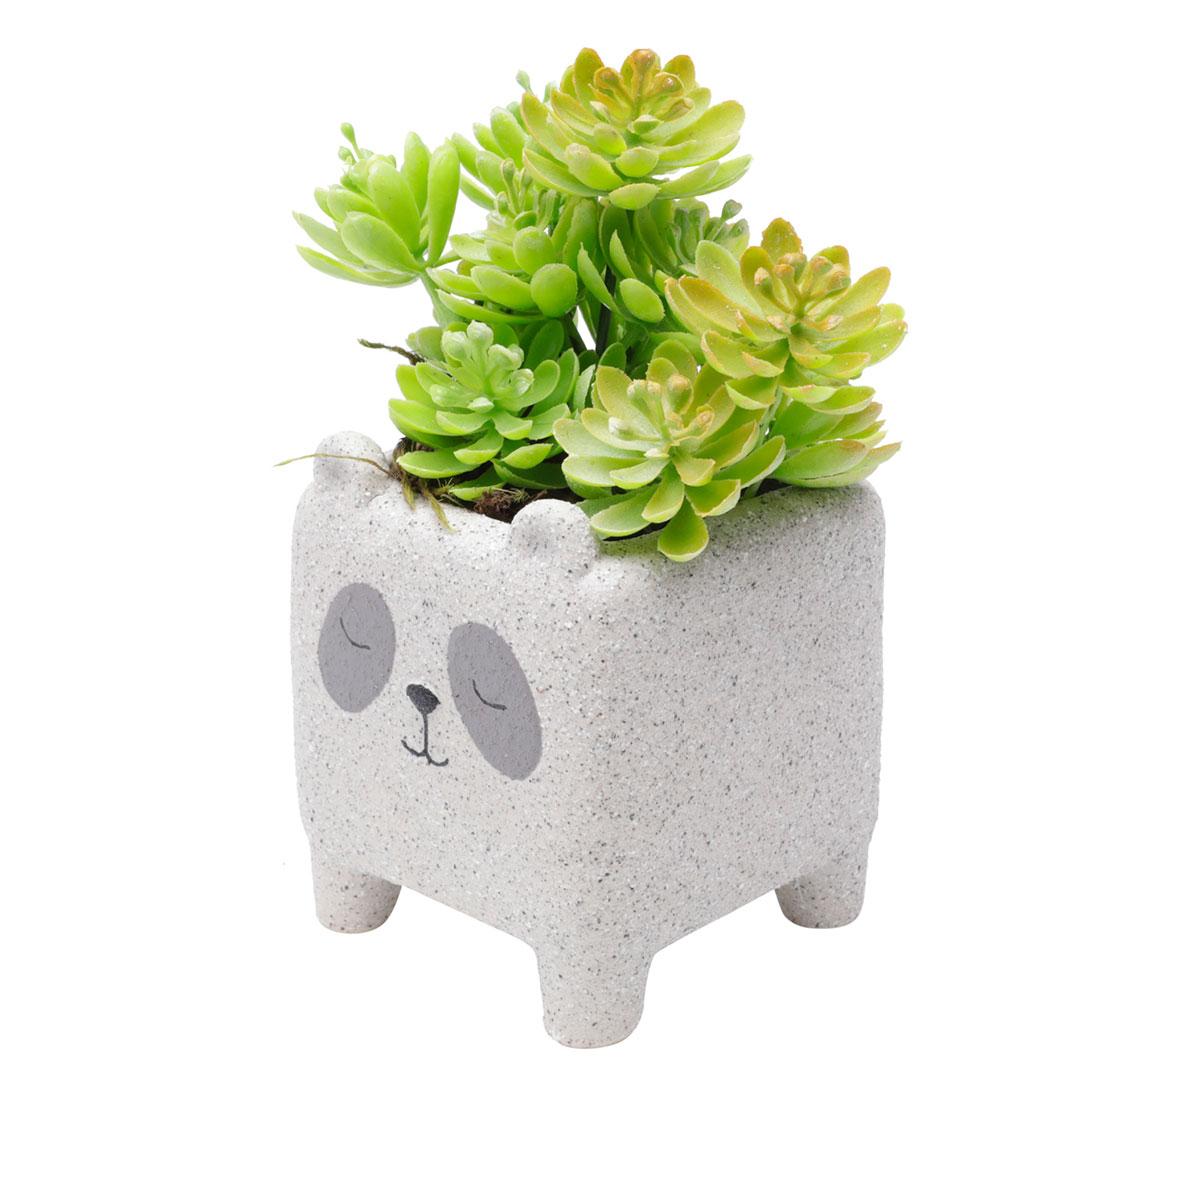 Cachepot Concreto Vaso Decorativo Sleeping Panda - Presente Super